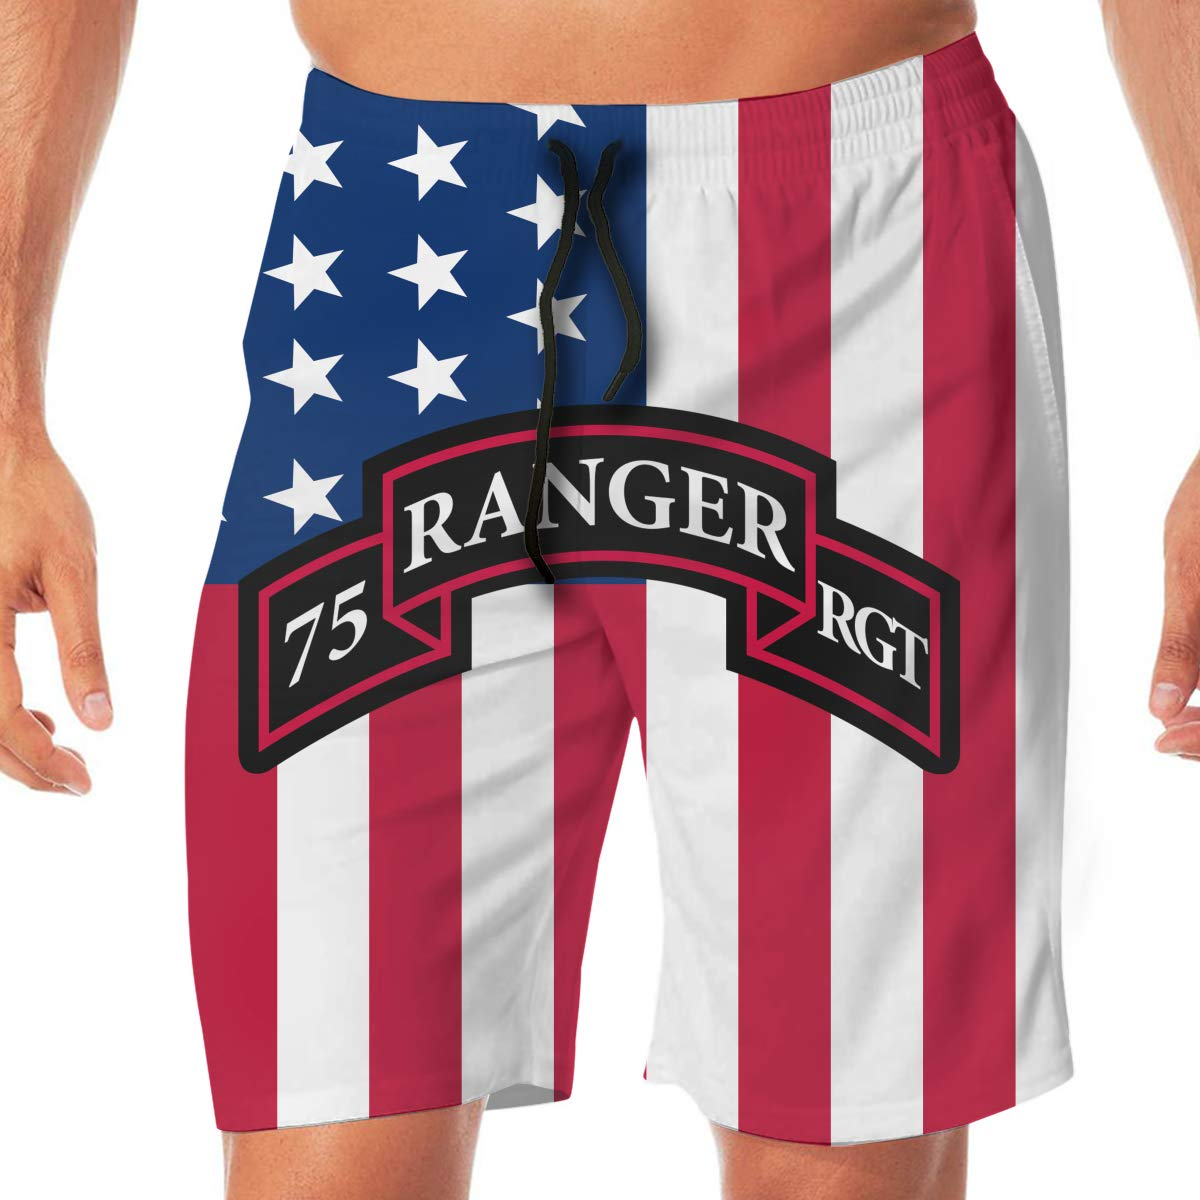 Army 75st Ranger Regiment Mens Classic Swim Beach Shorts with Pockets